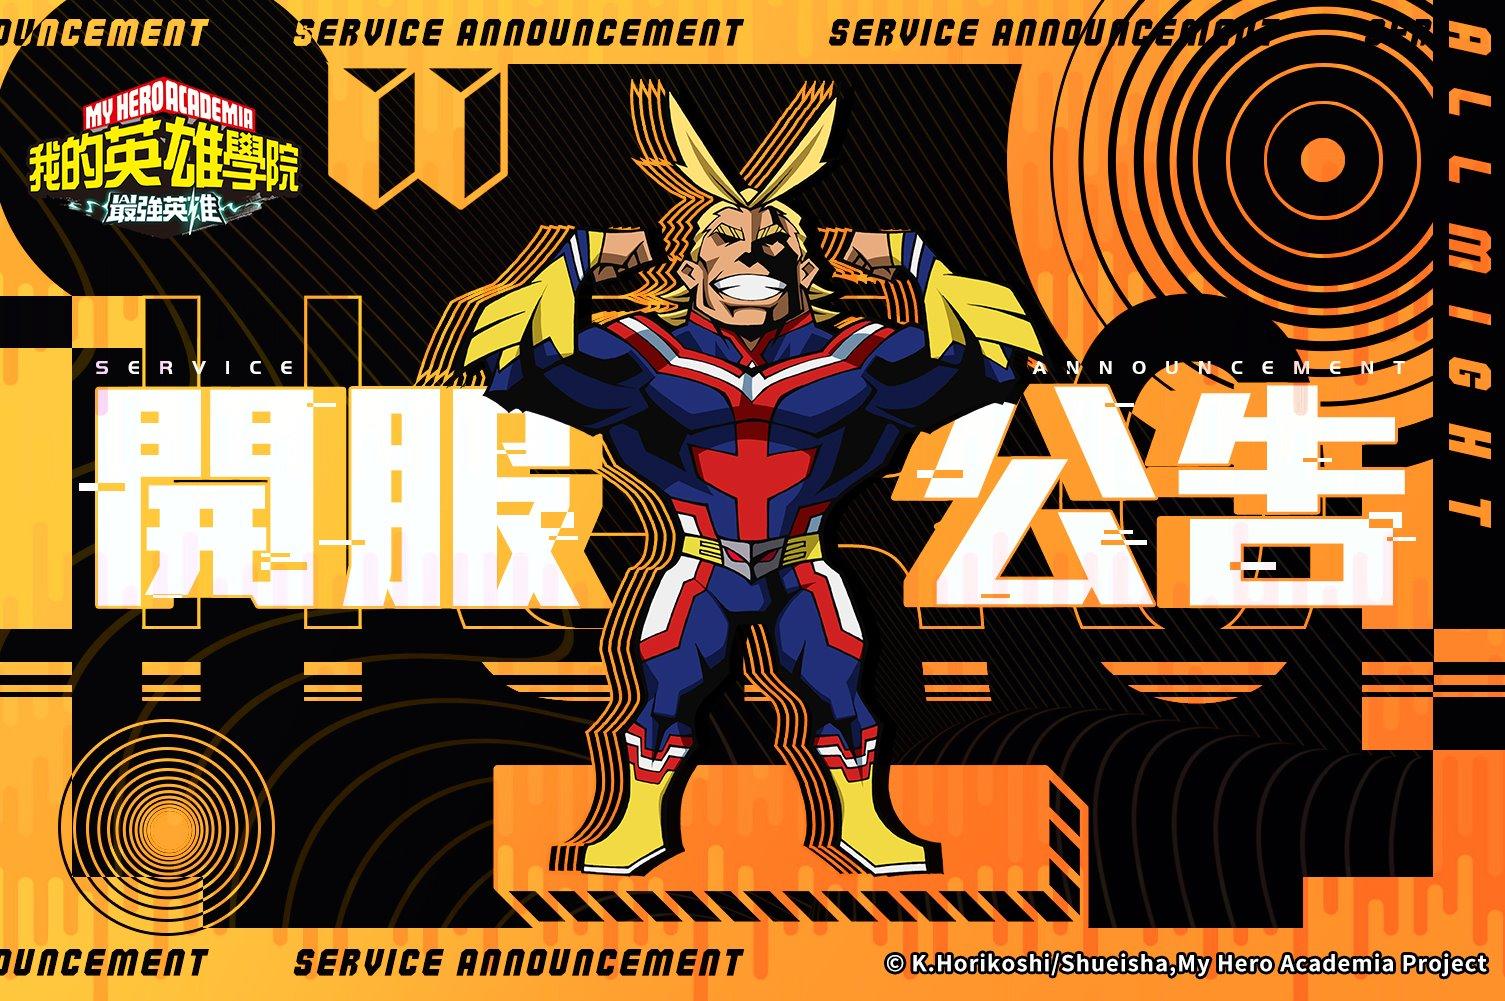 My Hero Academia 23920202 2